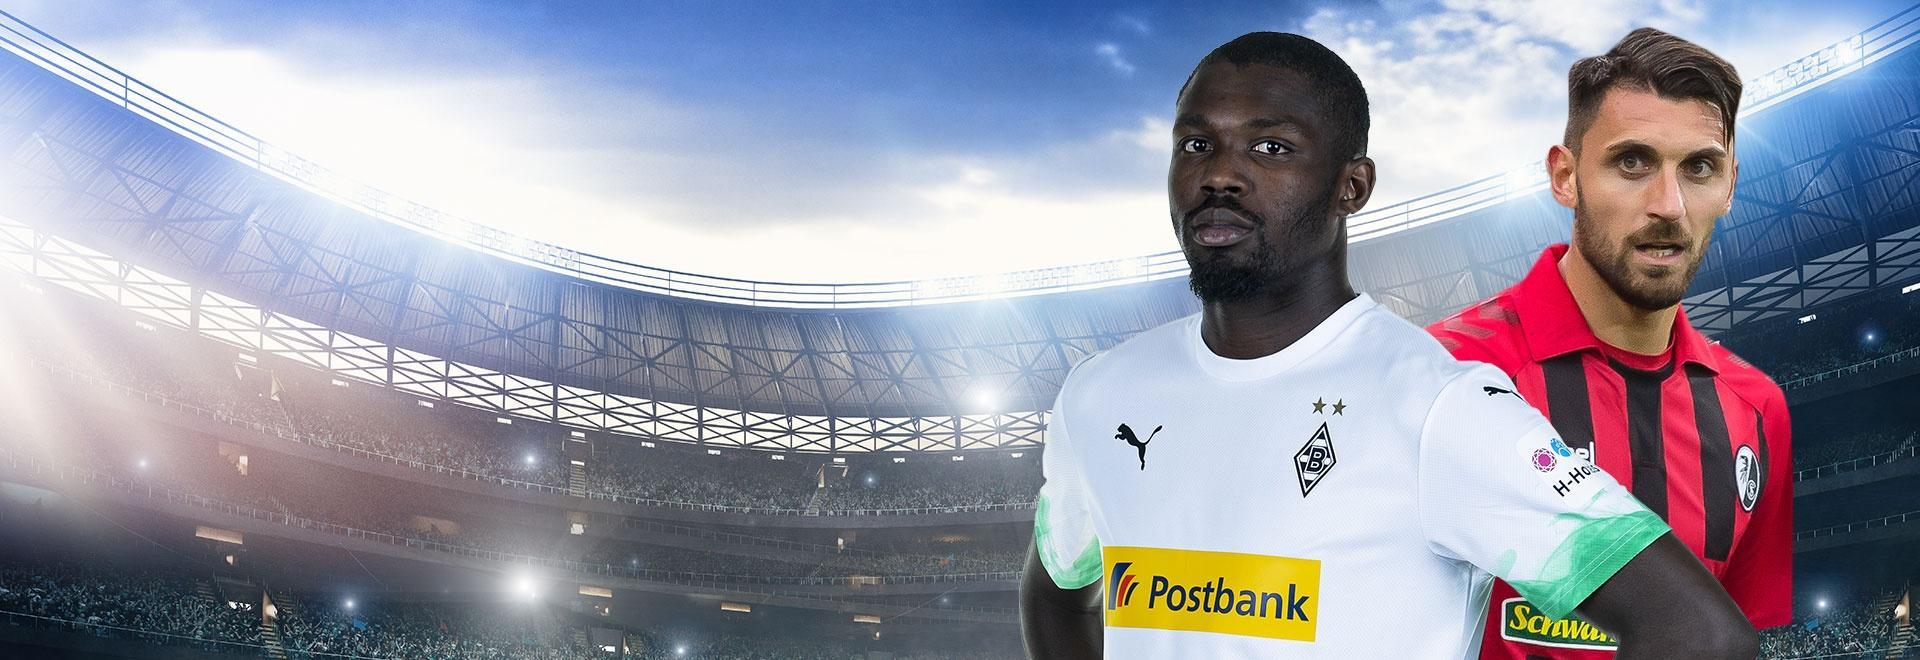 Borussia M. - Friburgo. 13a g.